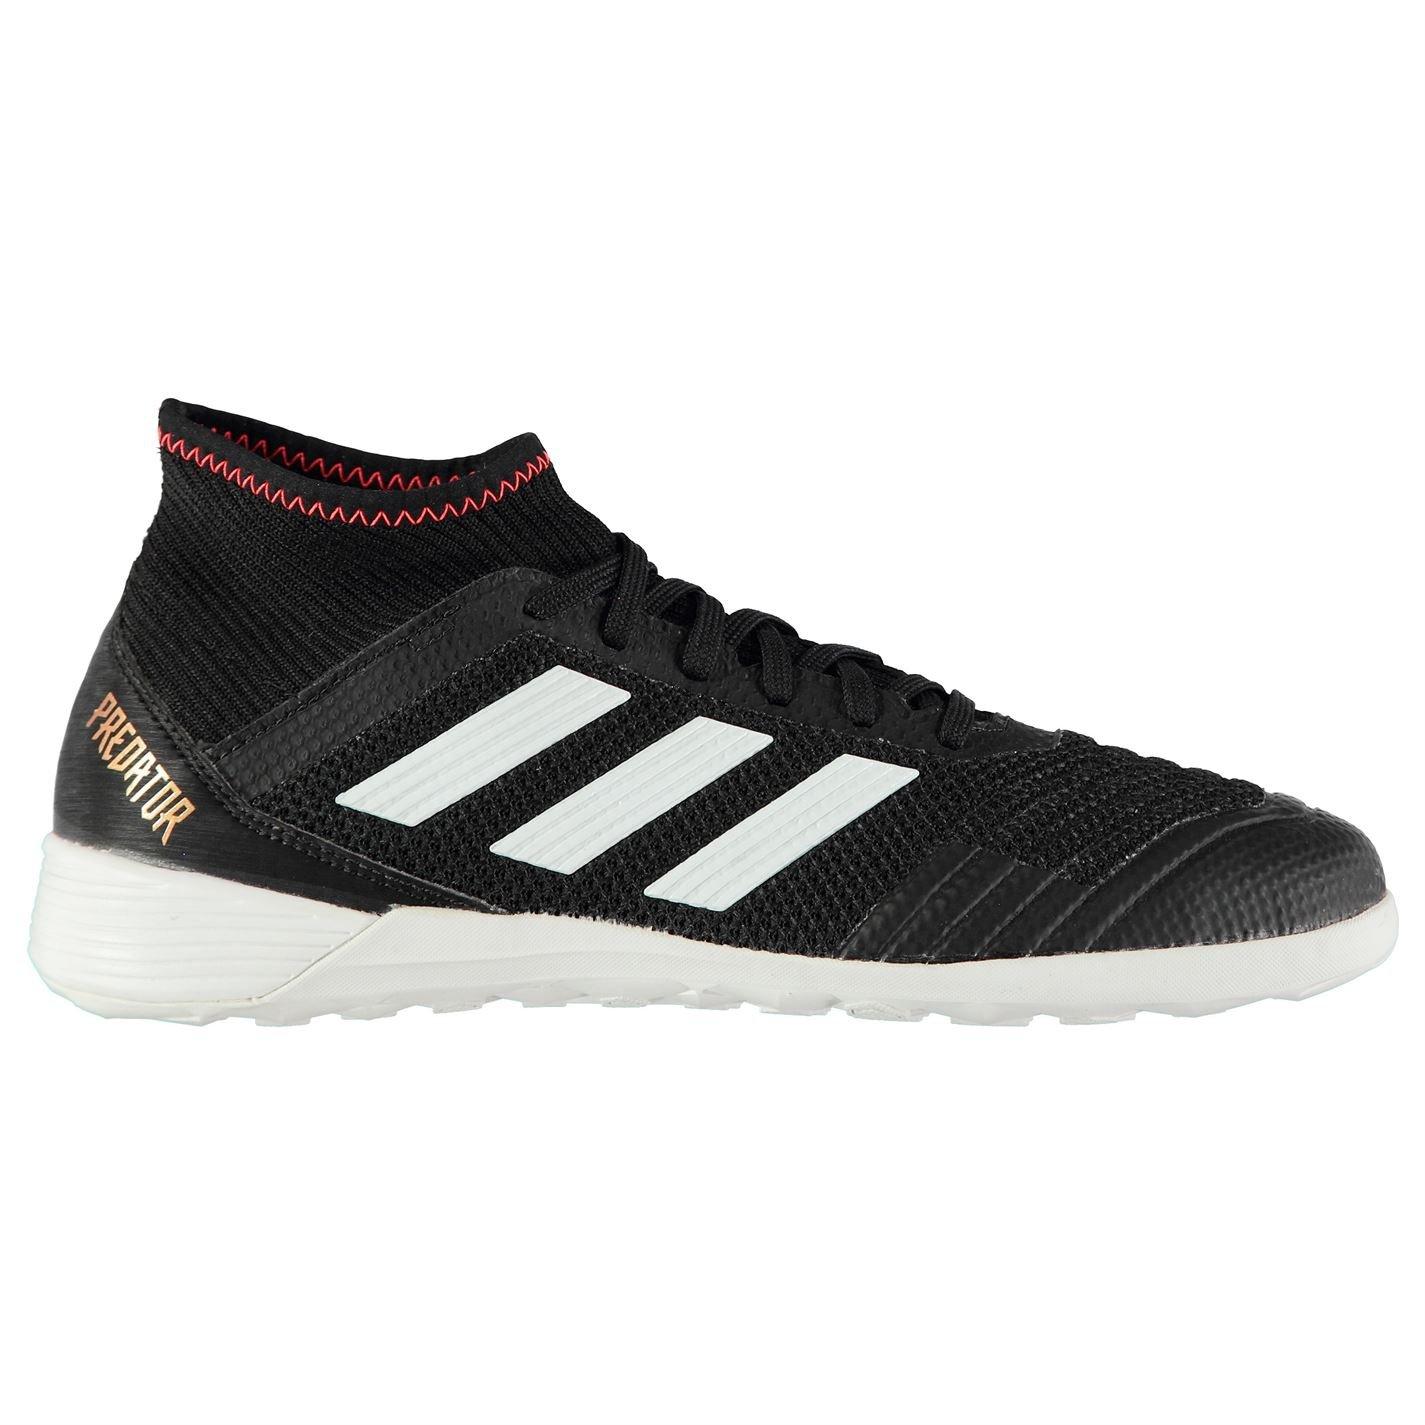 adidas Men's Predator Tango 18.3 in Footbal Shoes